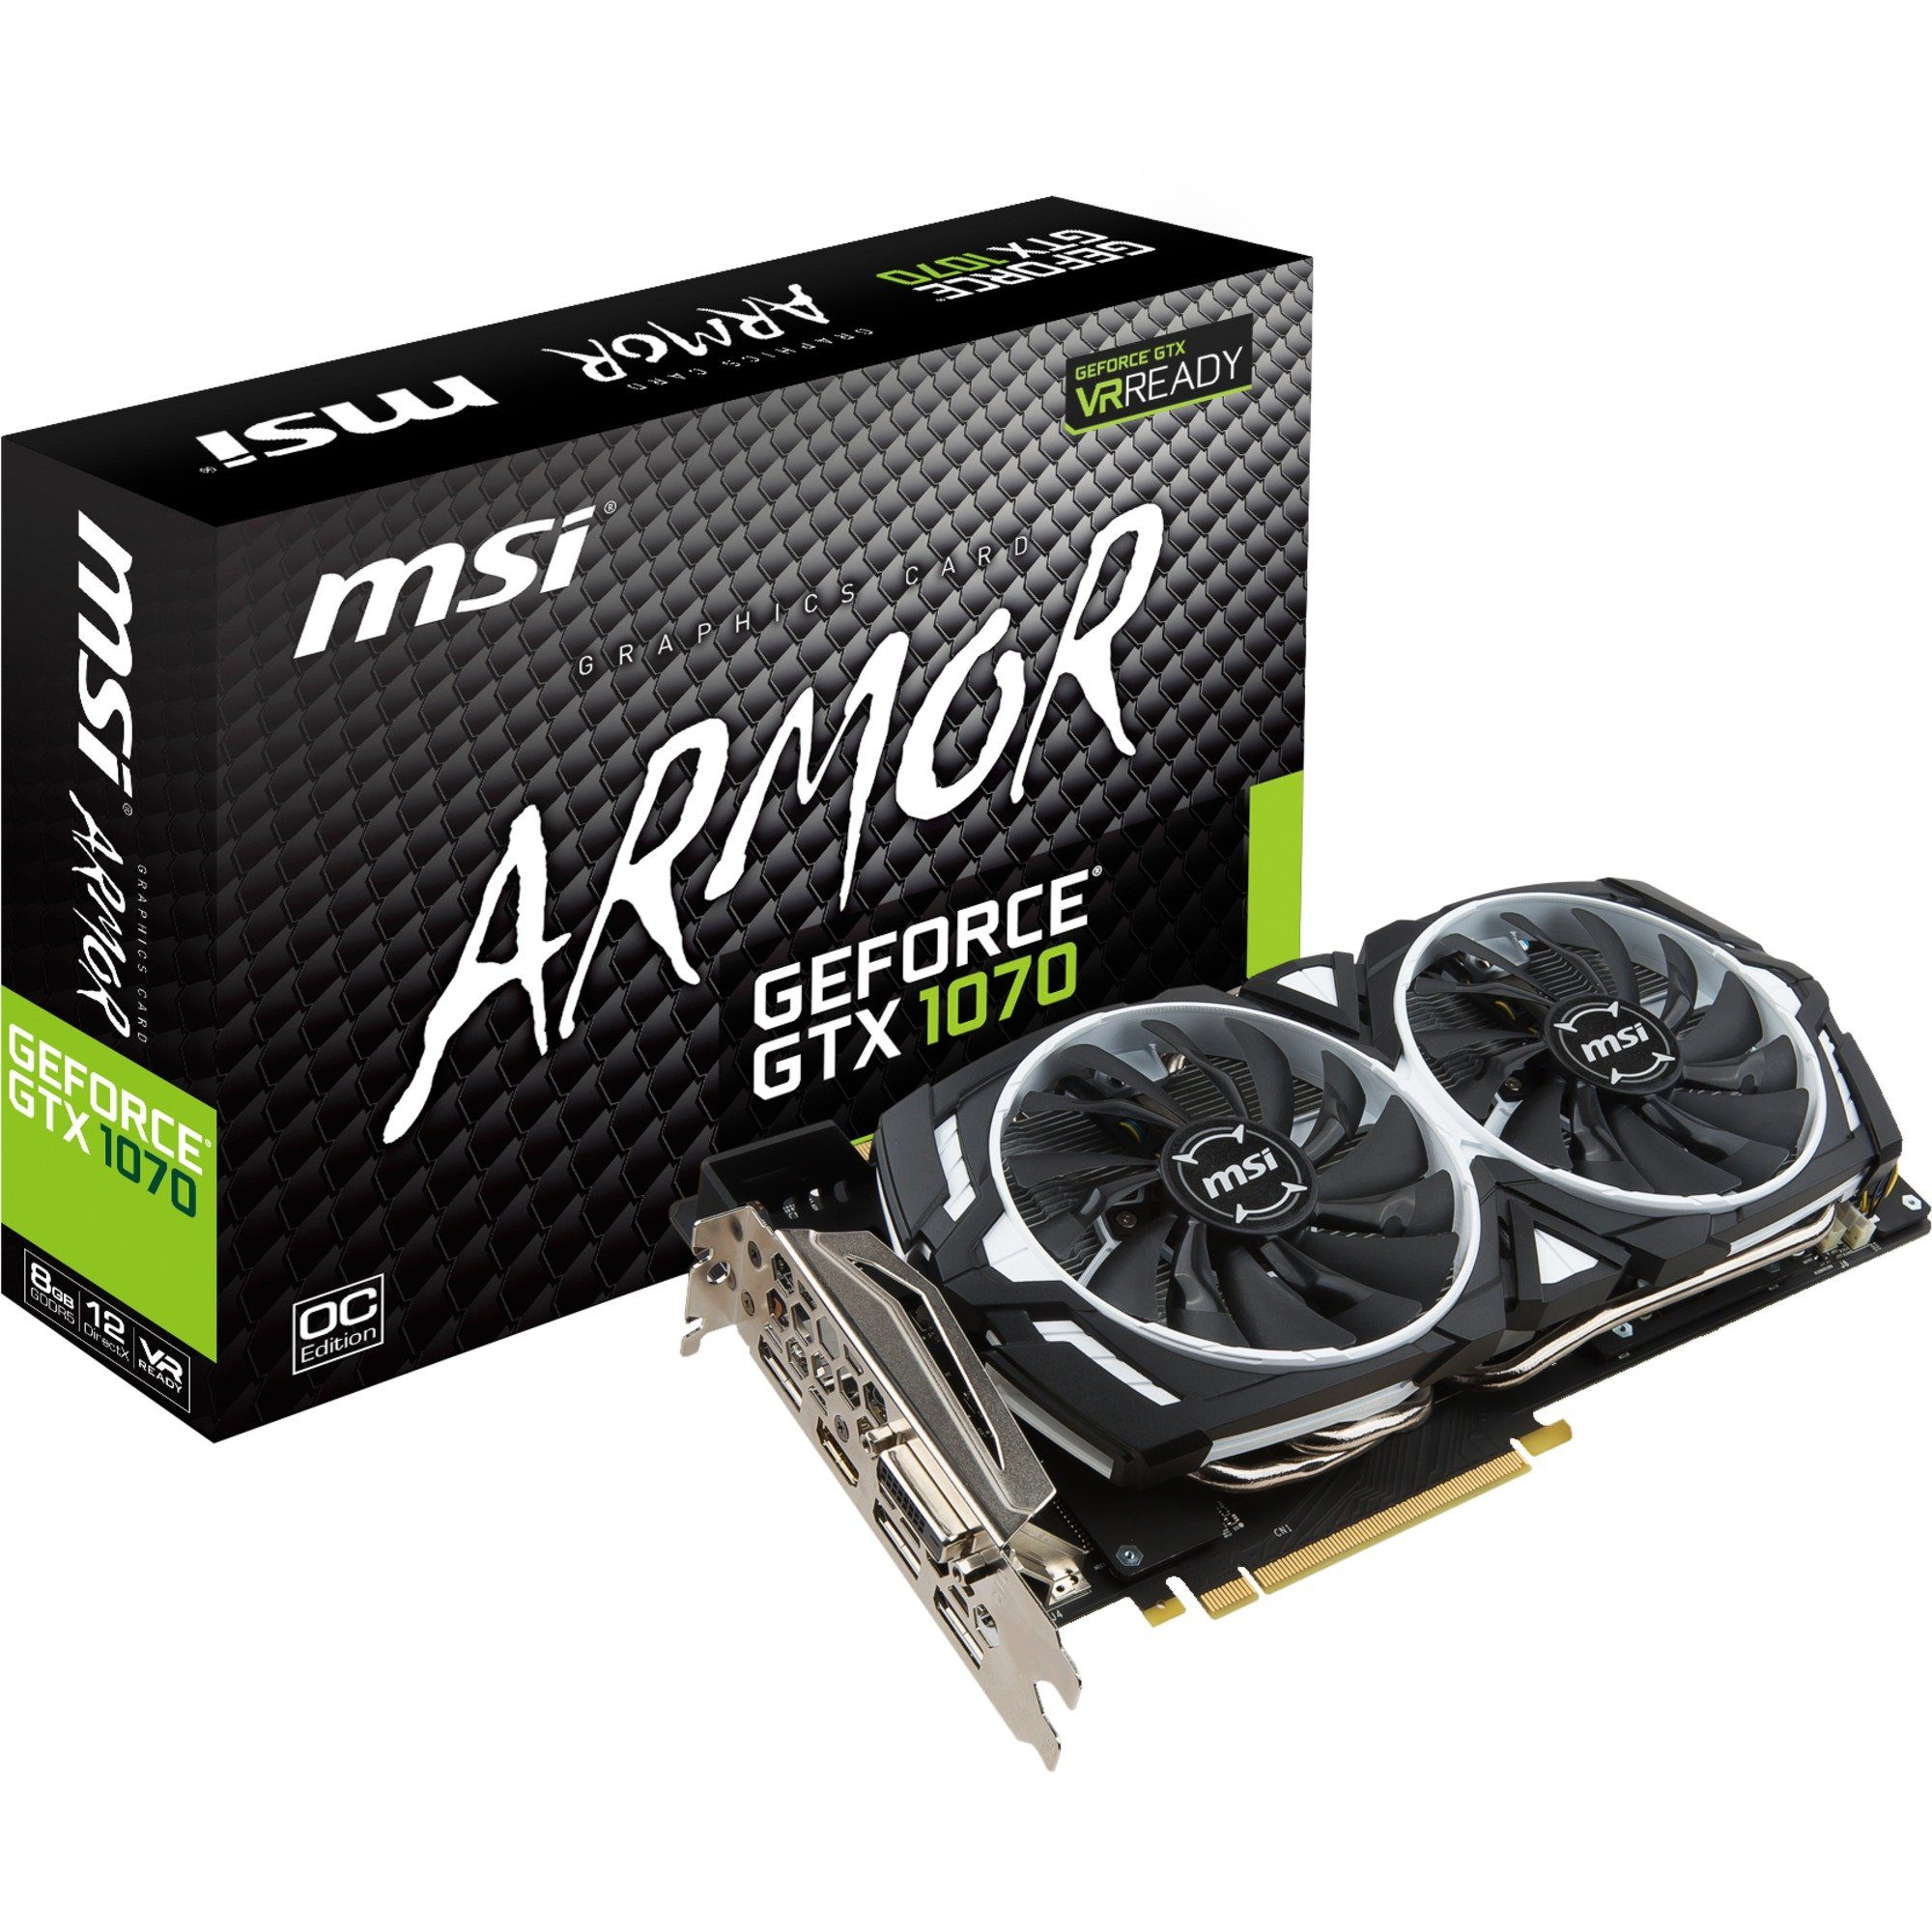 MSI Grafikkarte »GeForce GTX 1070 ARMOR 8G OC«